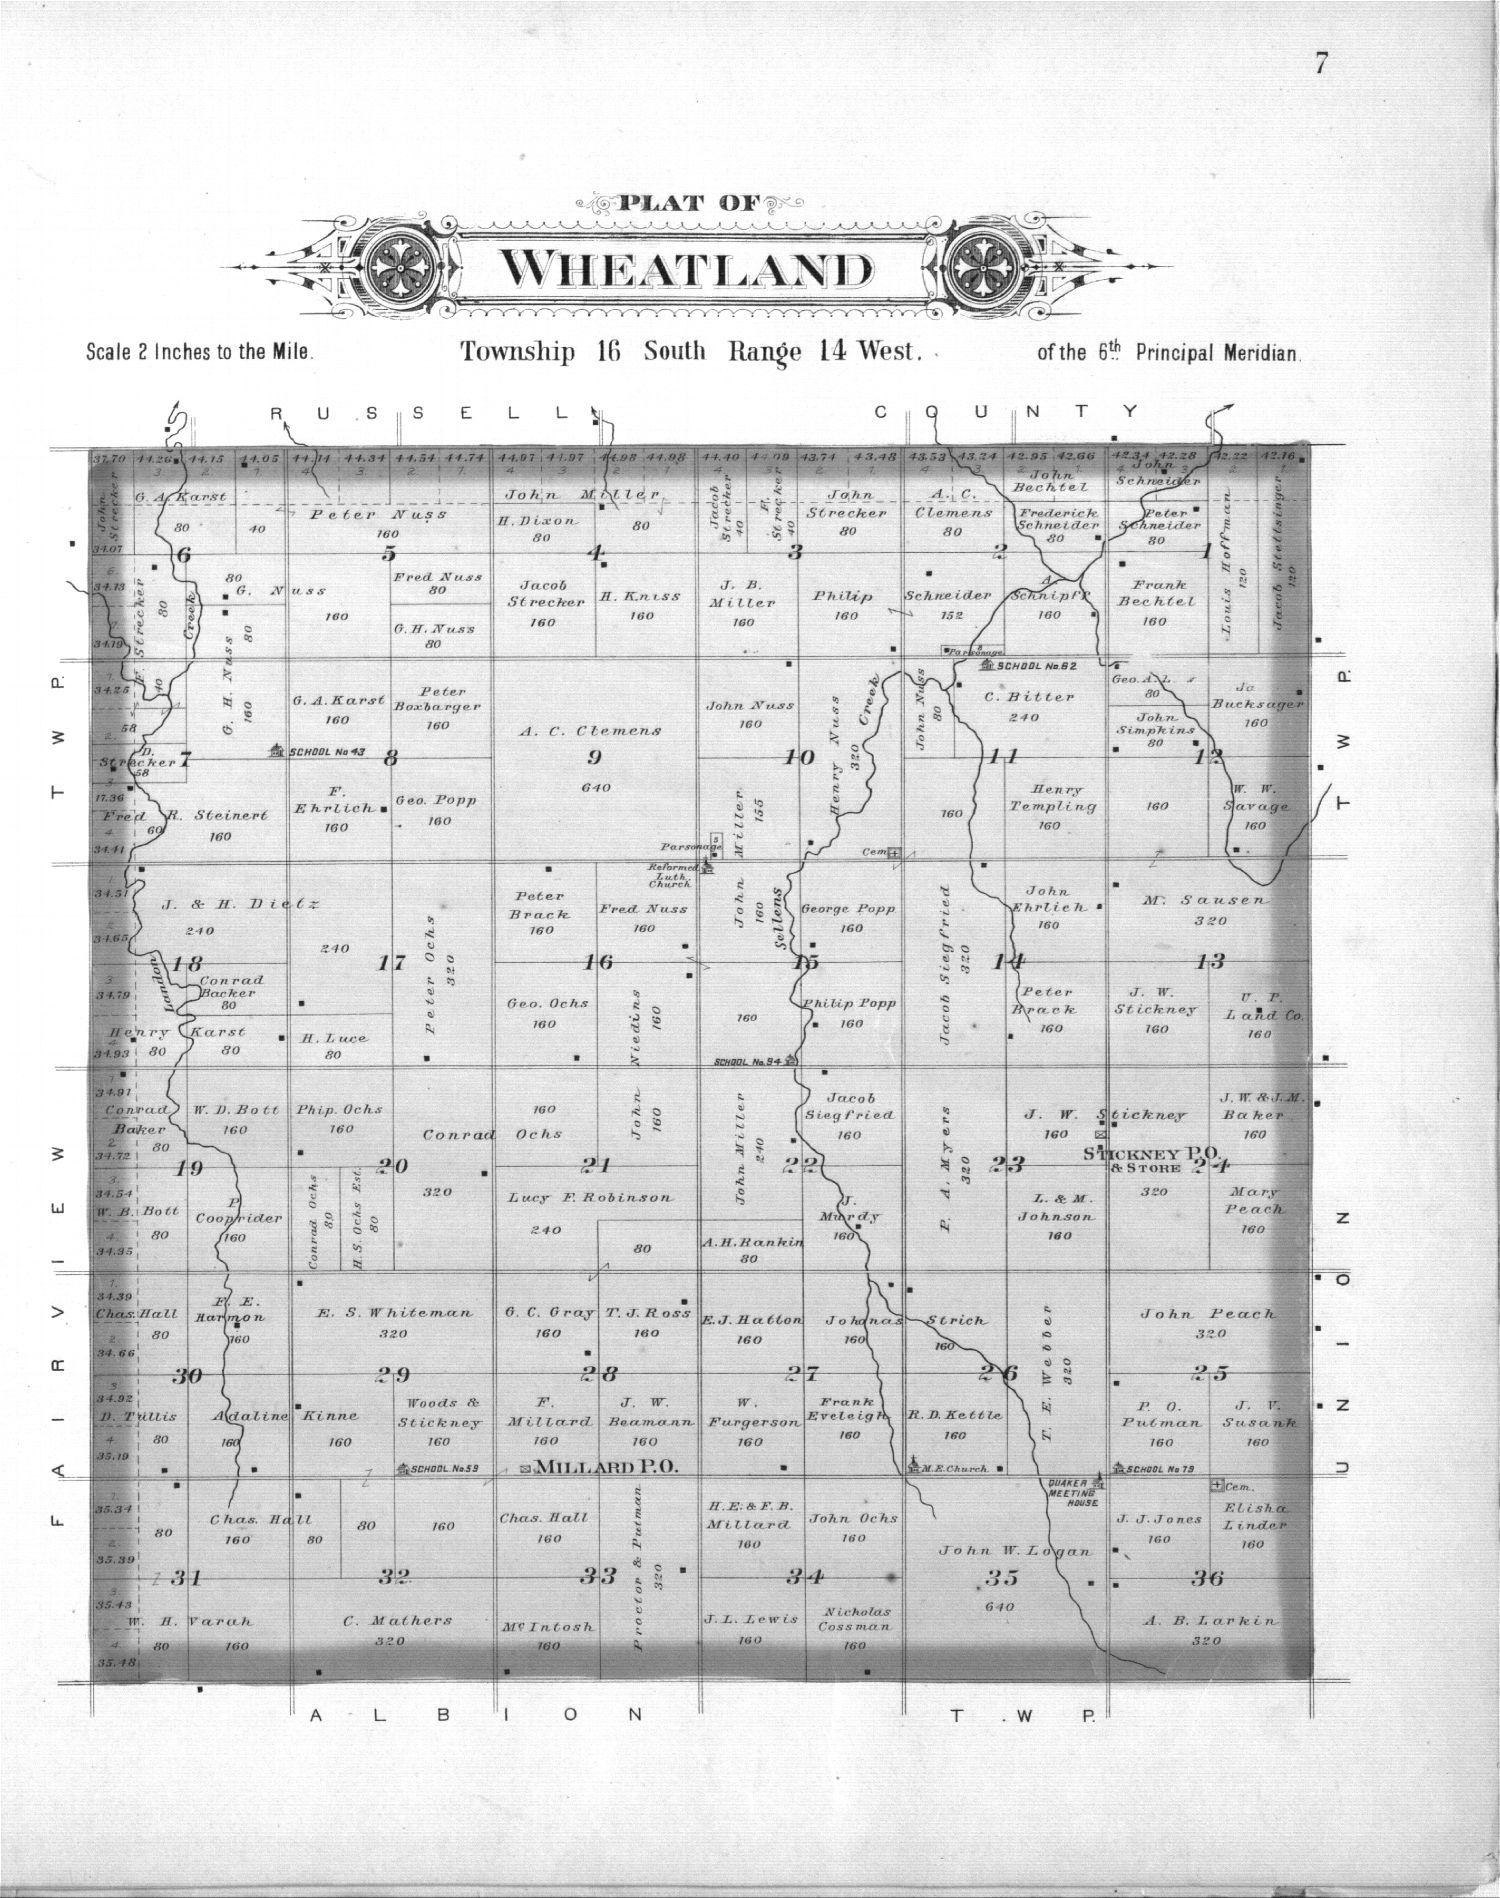 Plat book, Barton County, Kansas - 7